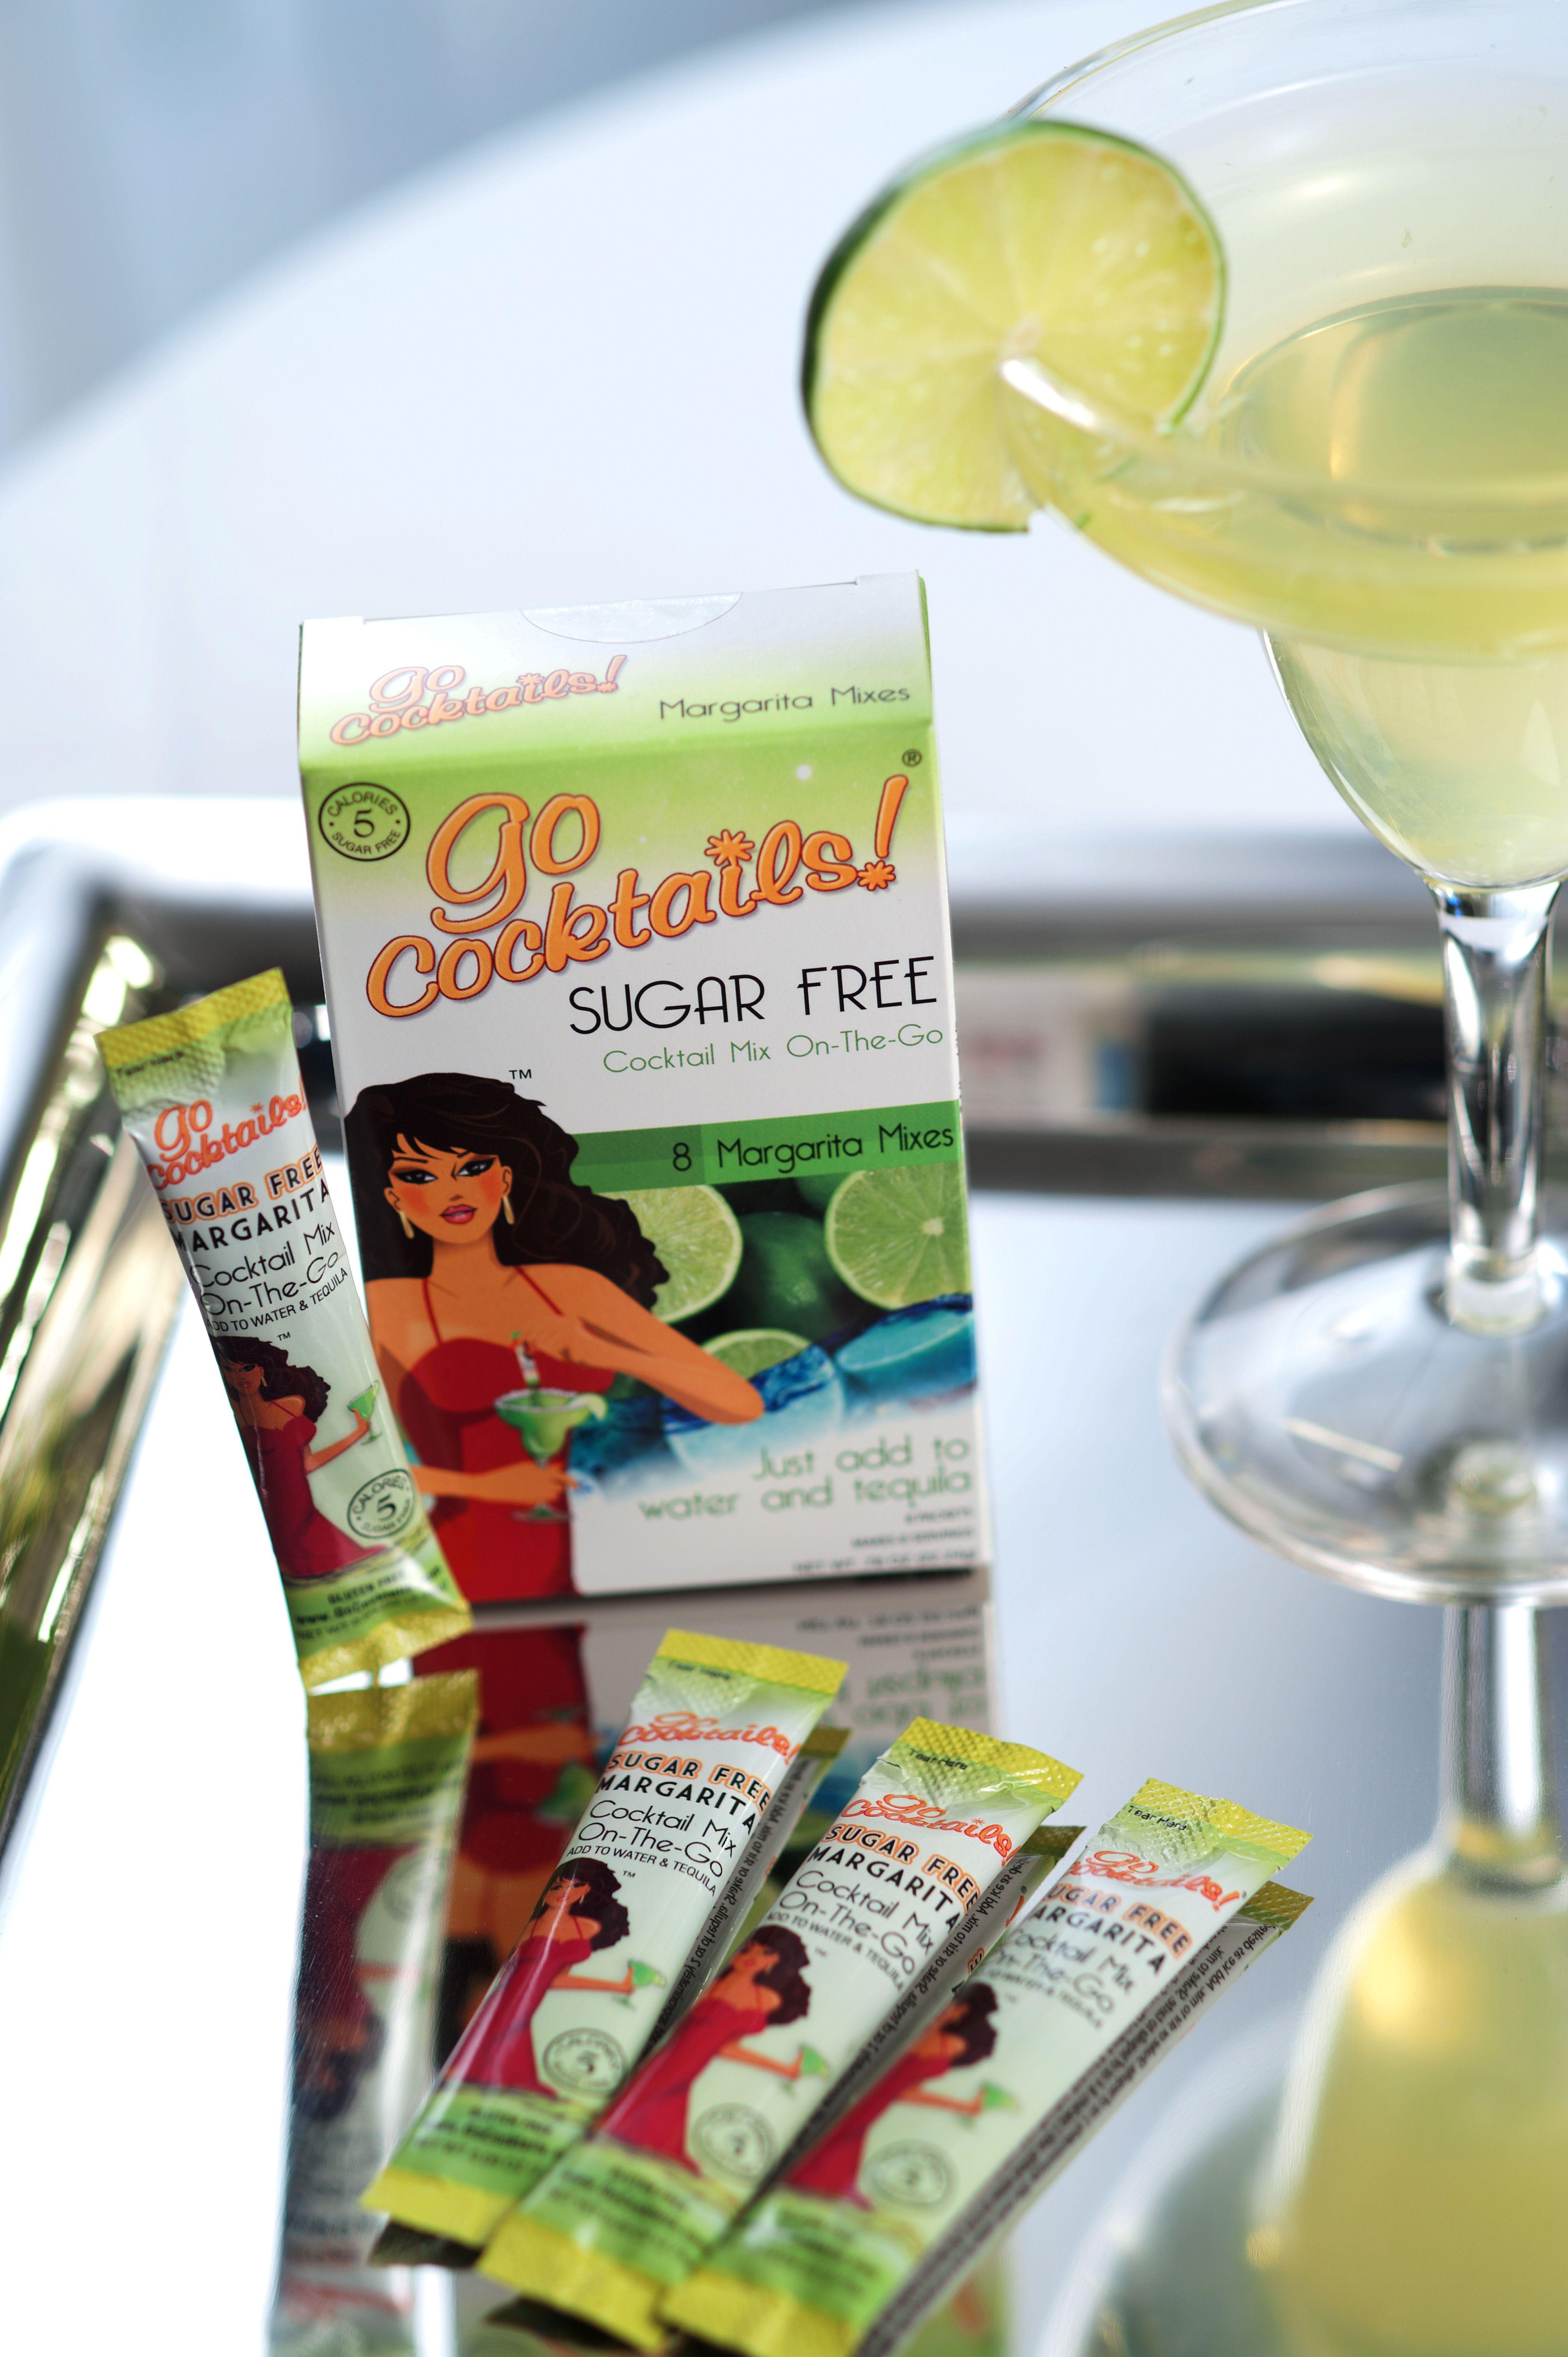 Jose Cuervo Sugar Free Margarita Mix Nutrition Facts